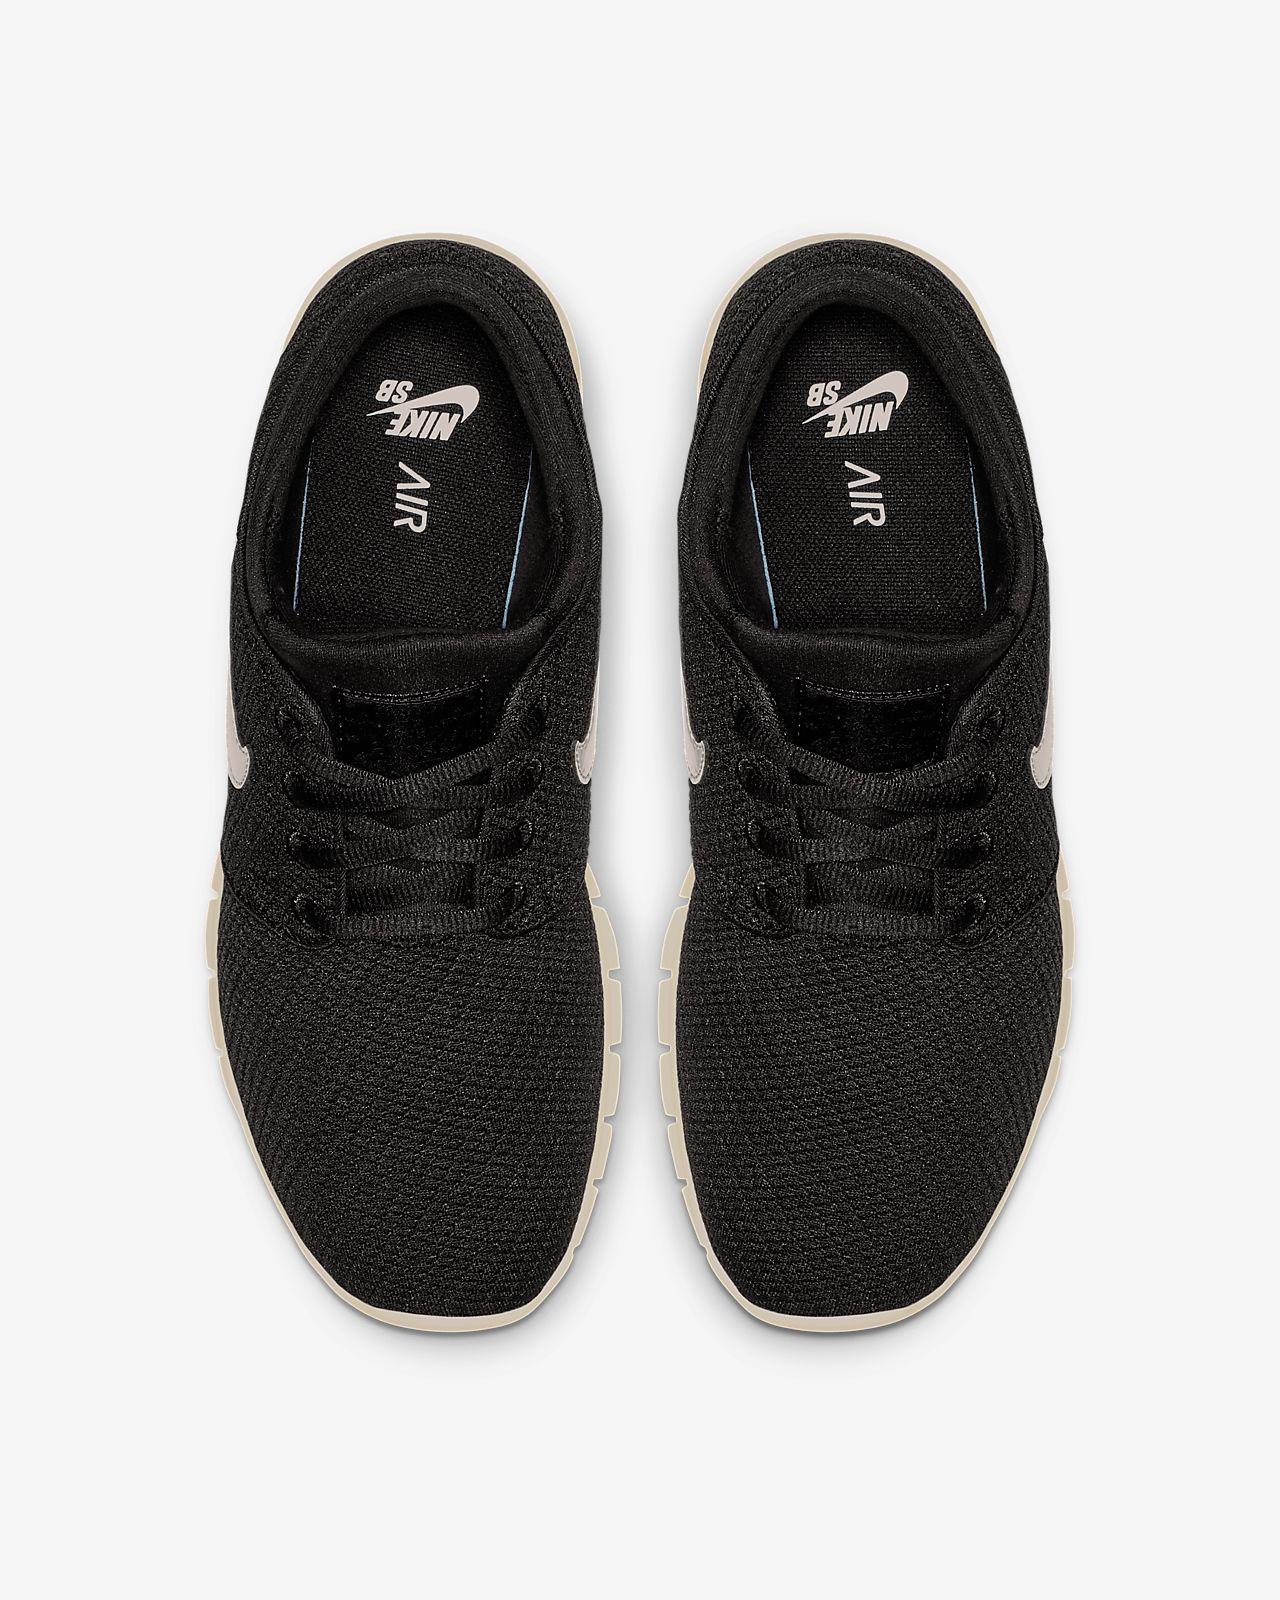 2a572de54628 Nike SB Stefan Janoski Max Skate Shoe. Nike.com